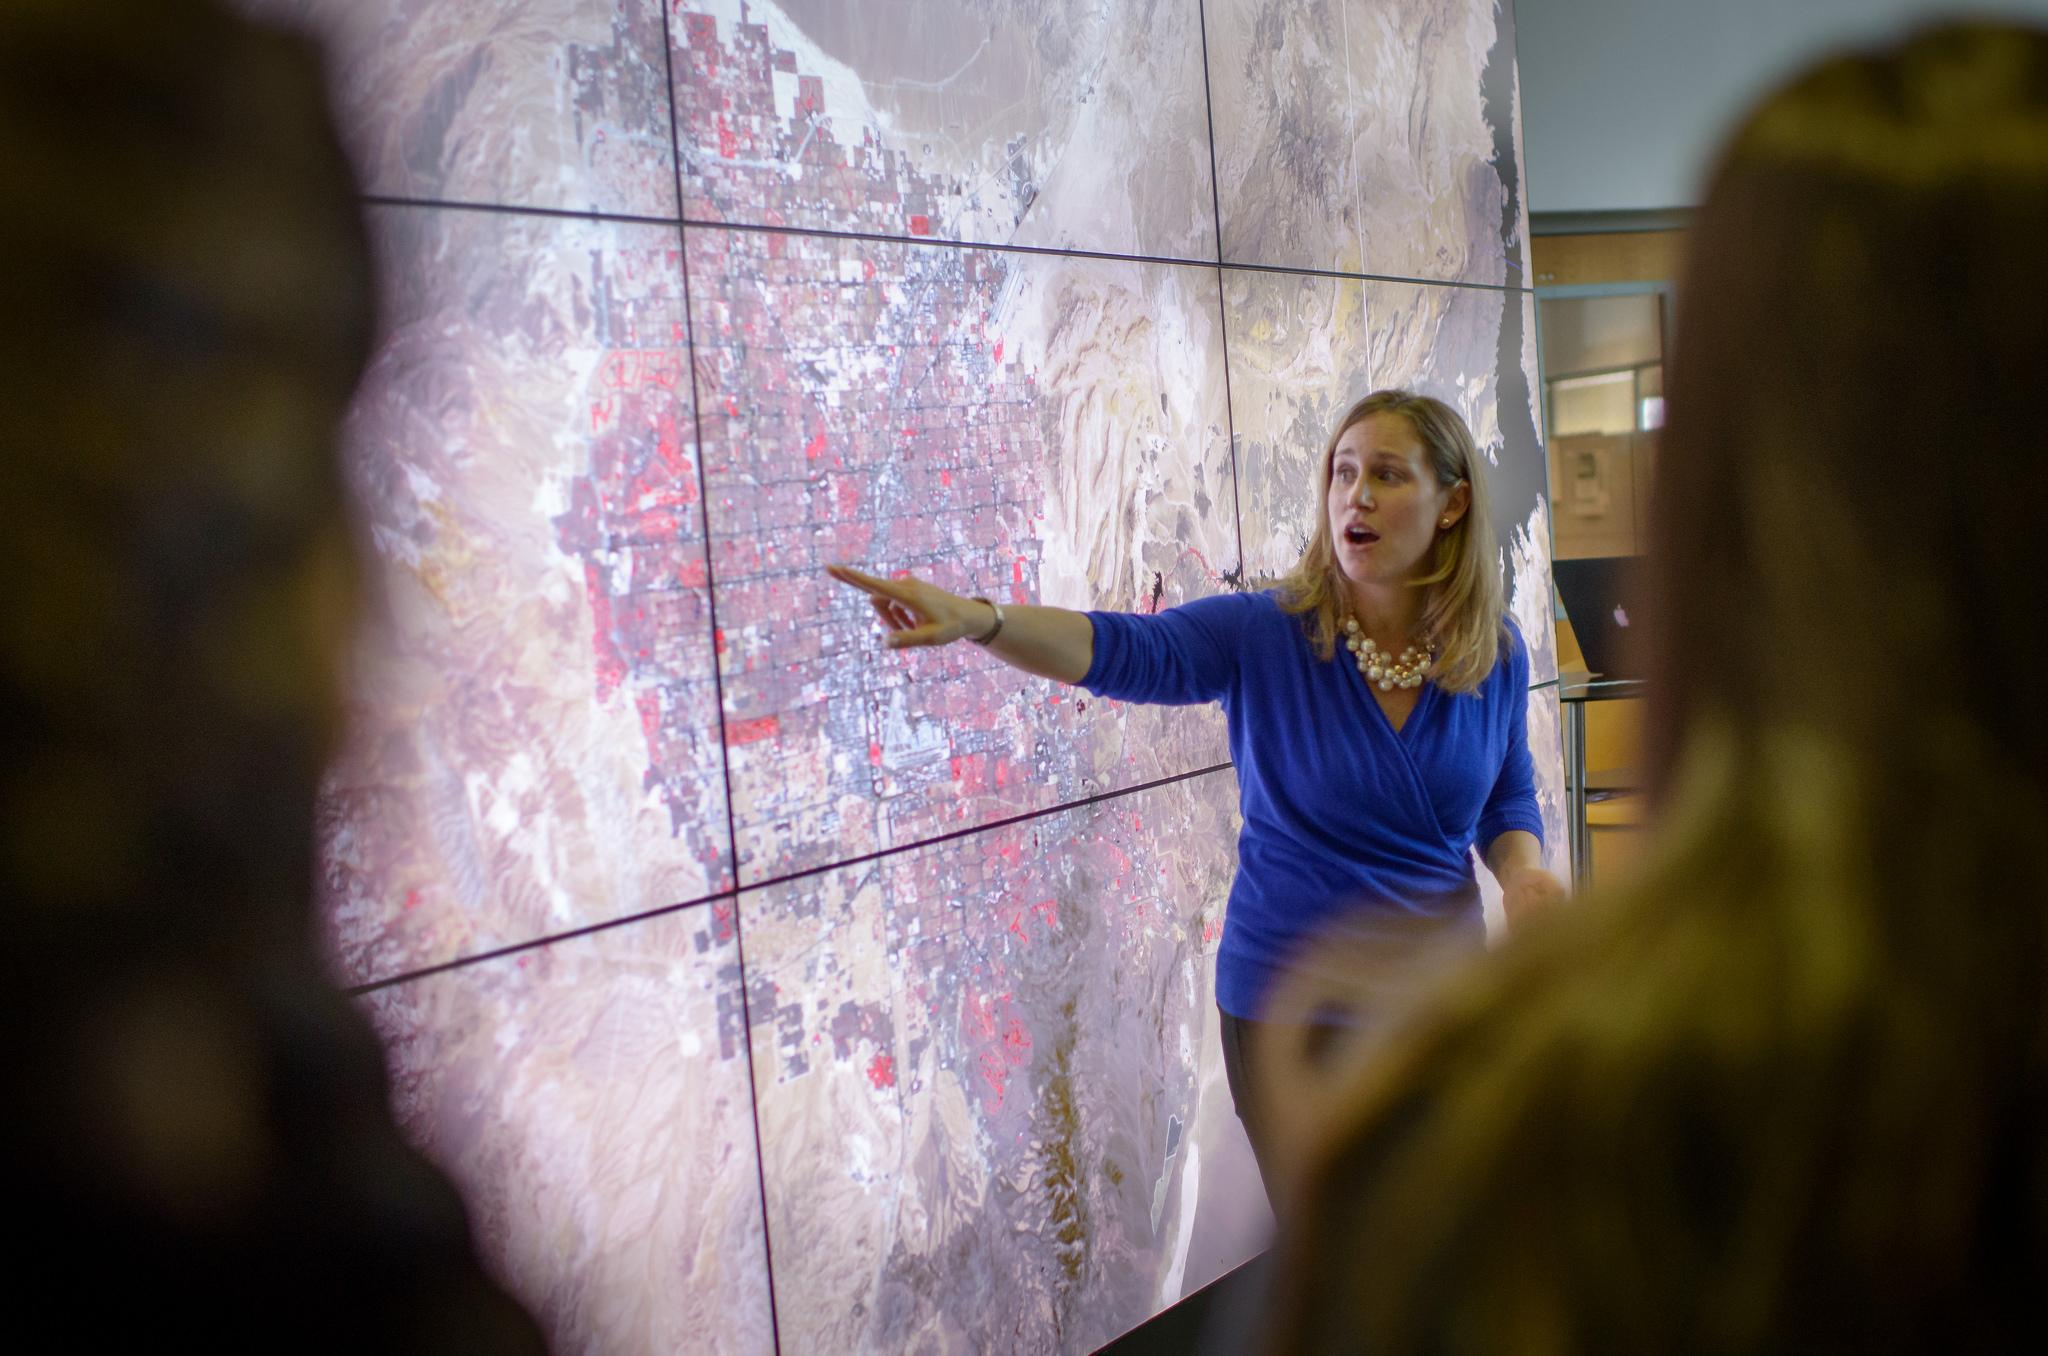 nasa jobs - Astronomy Jobs At Nasa